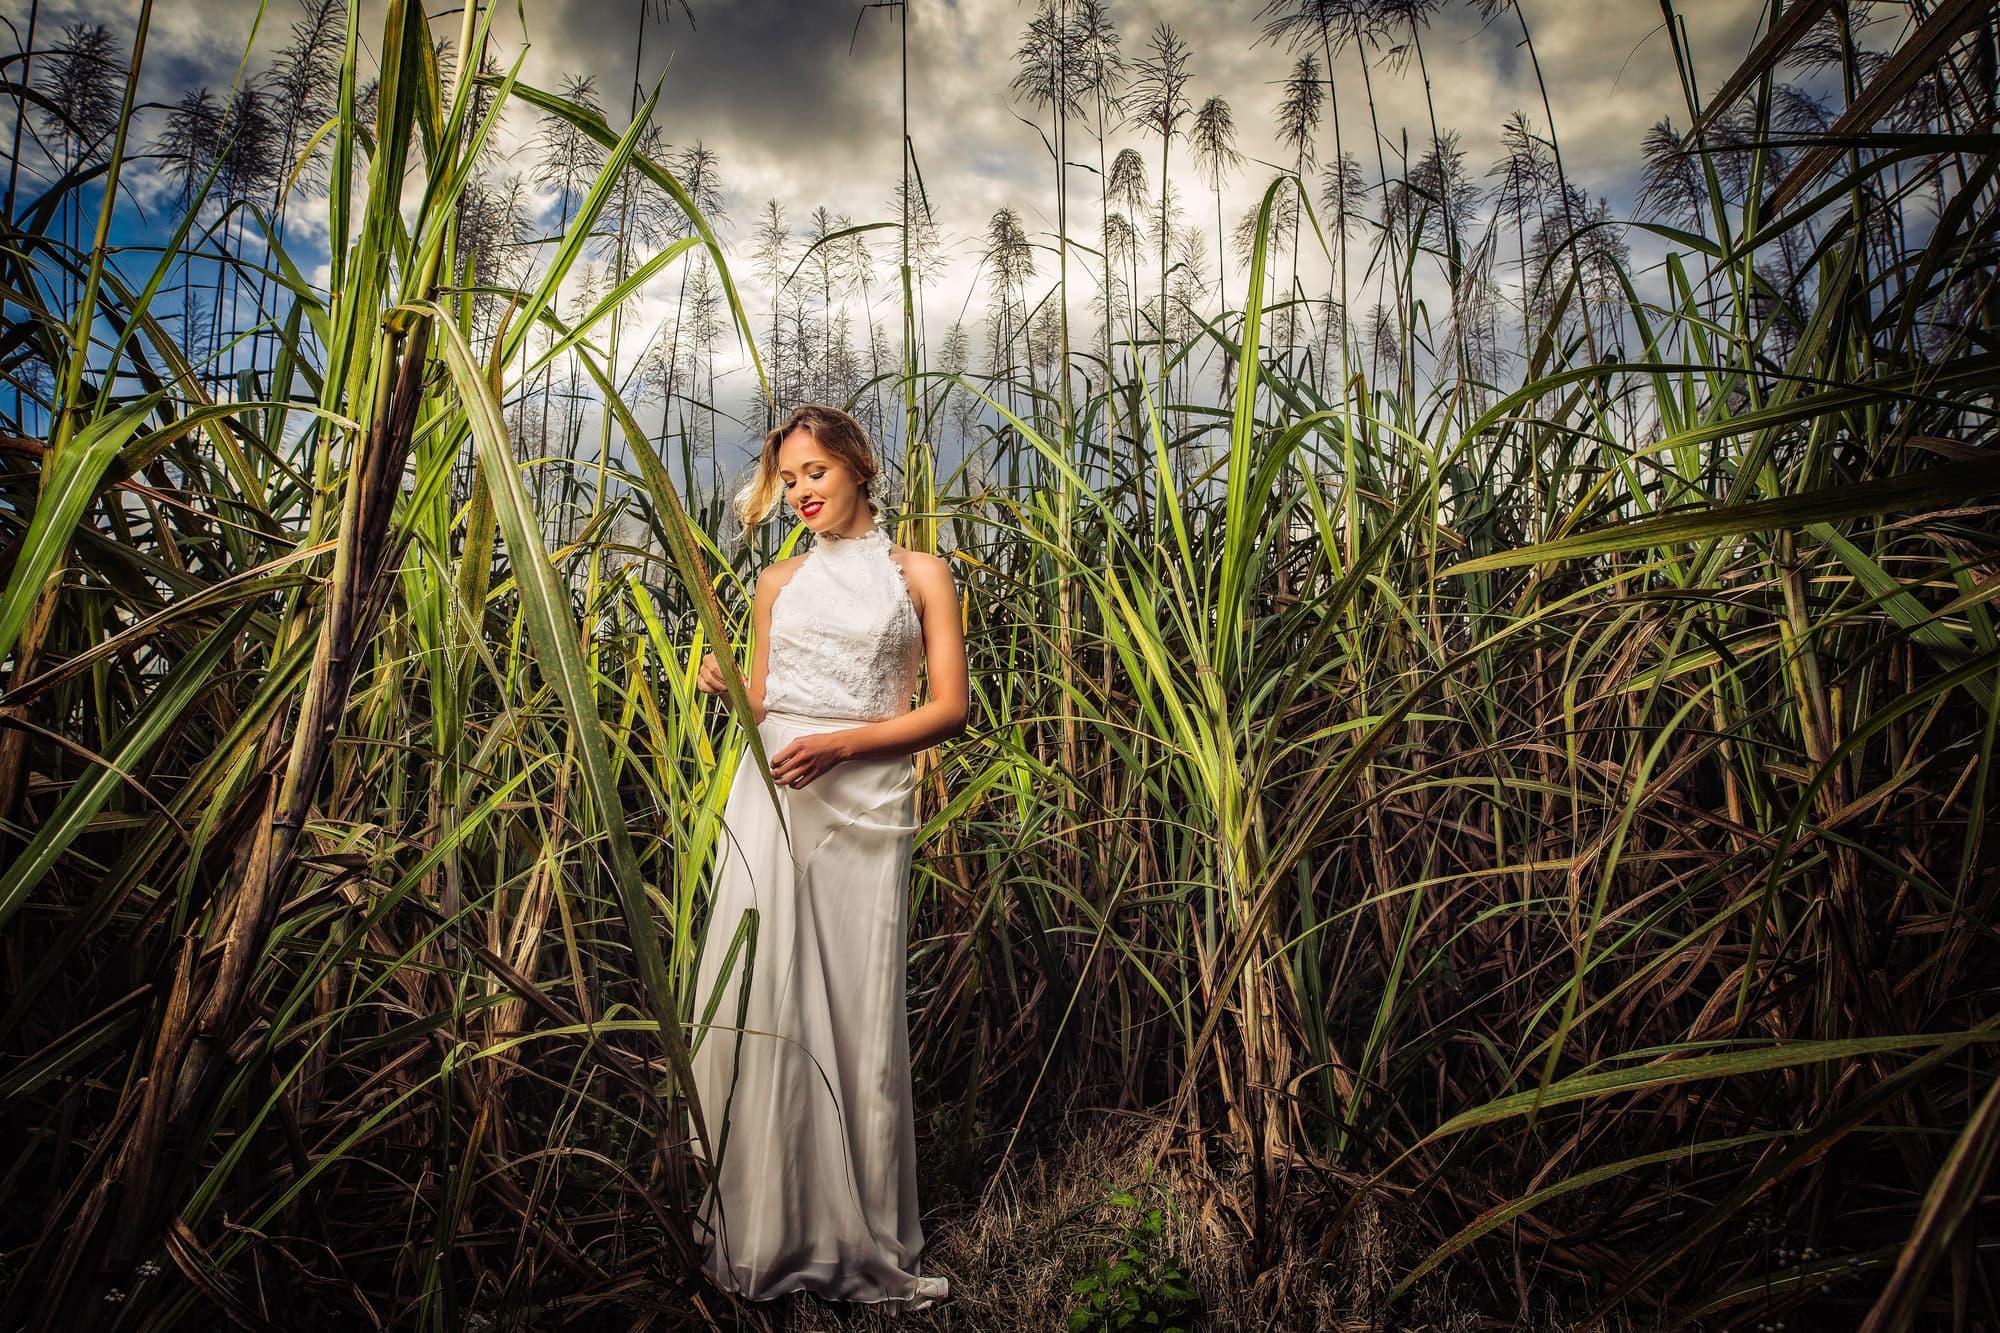 Sugar cane photoshoot Bridal session-1.jpg